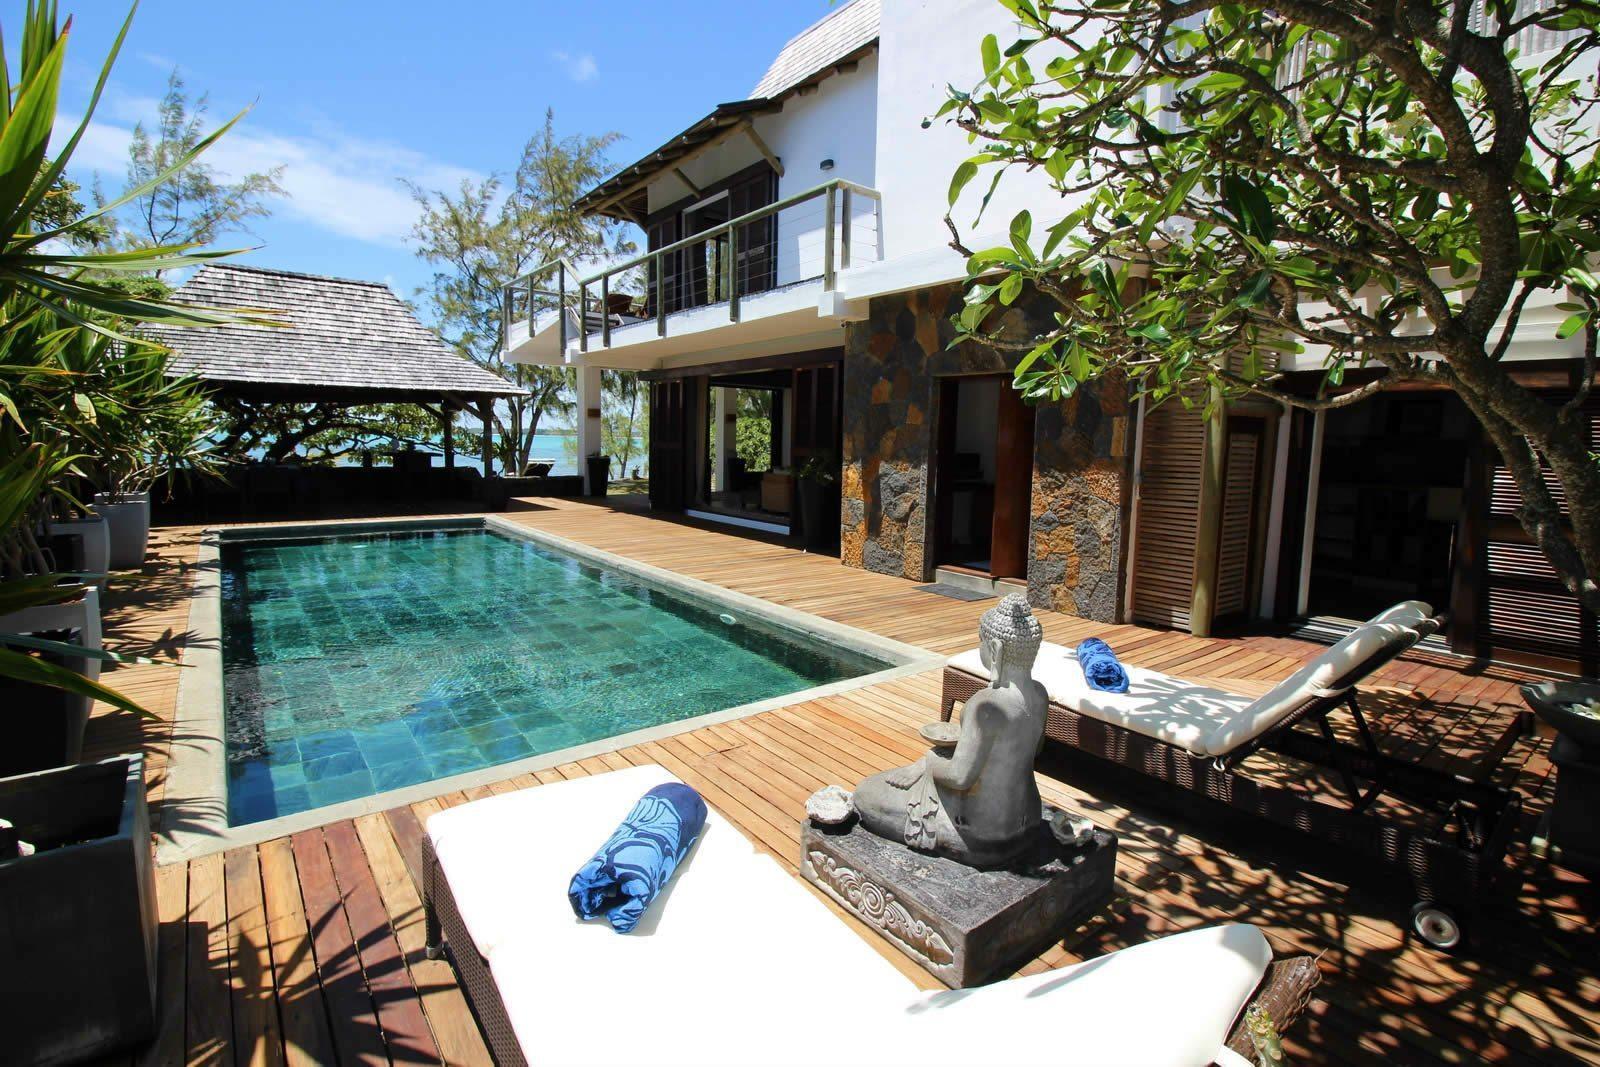 villa-luxueuse-piscine-vue-mer-a-vendre-poste-lafayette